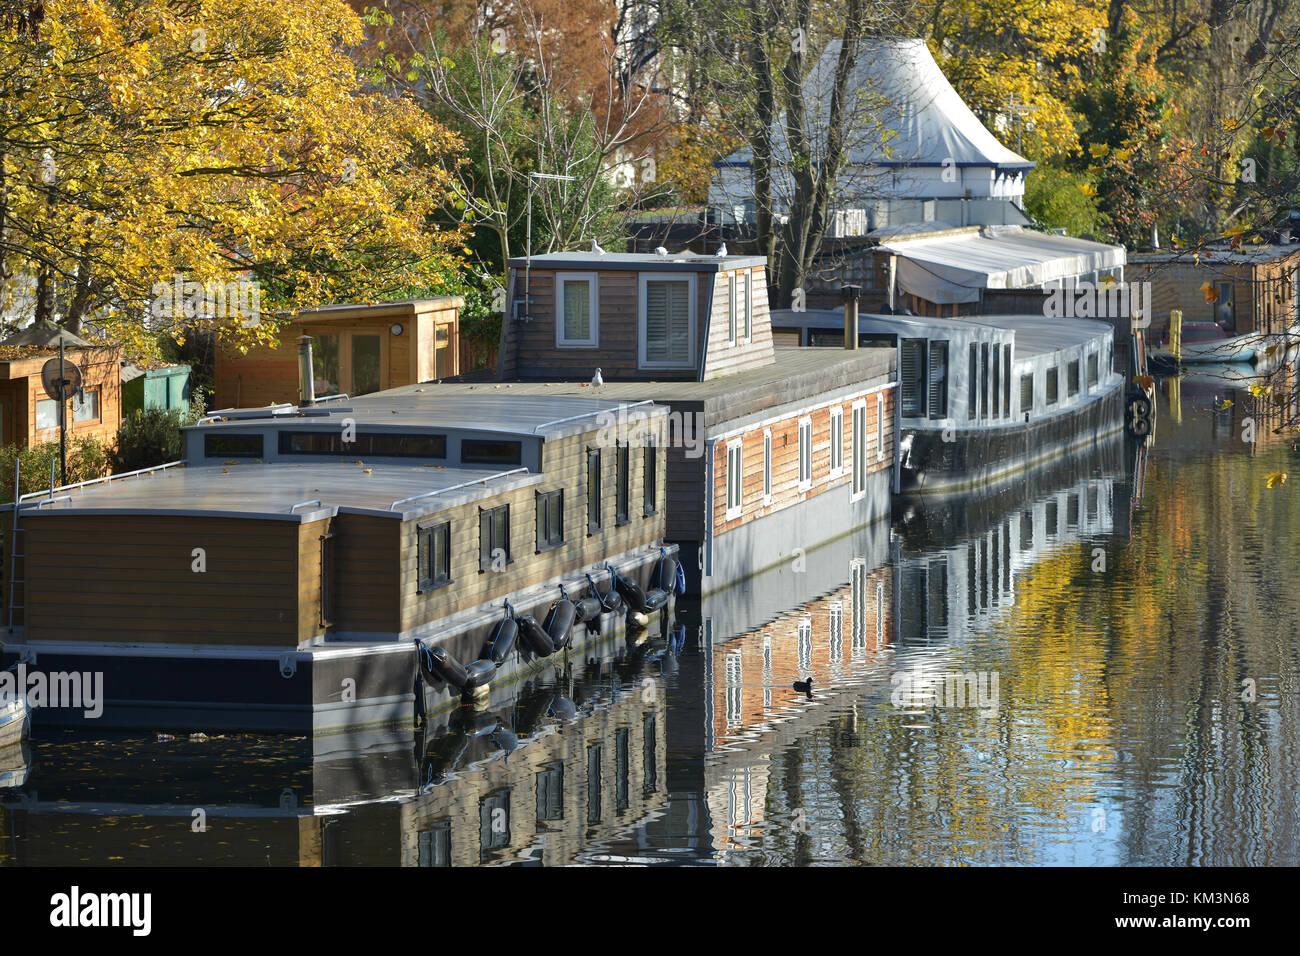 The Summerhouse, Little Venice, Westminster, London. - Stock Image